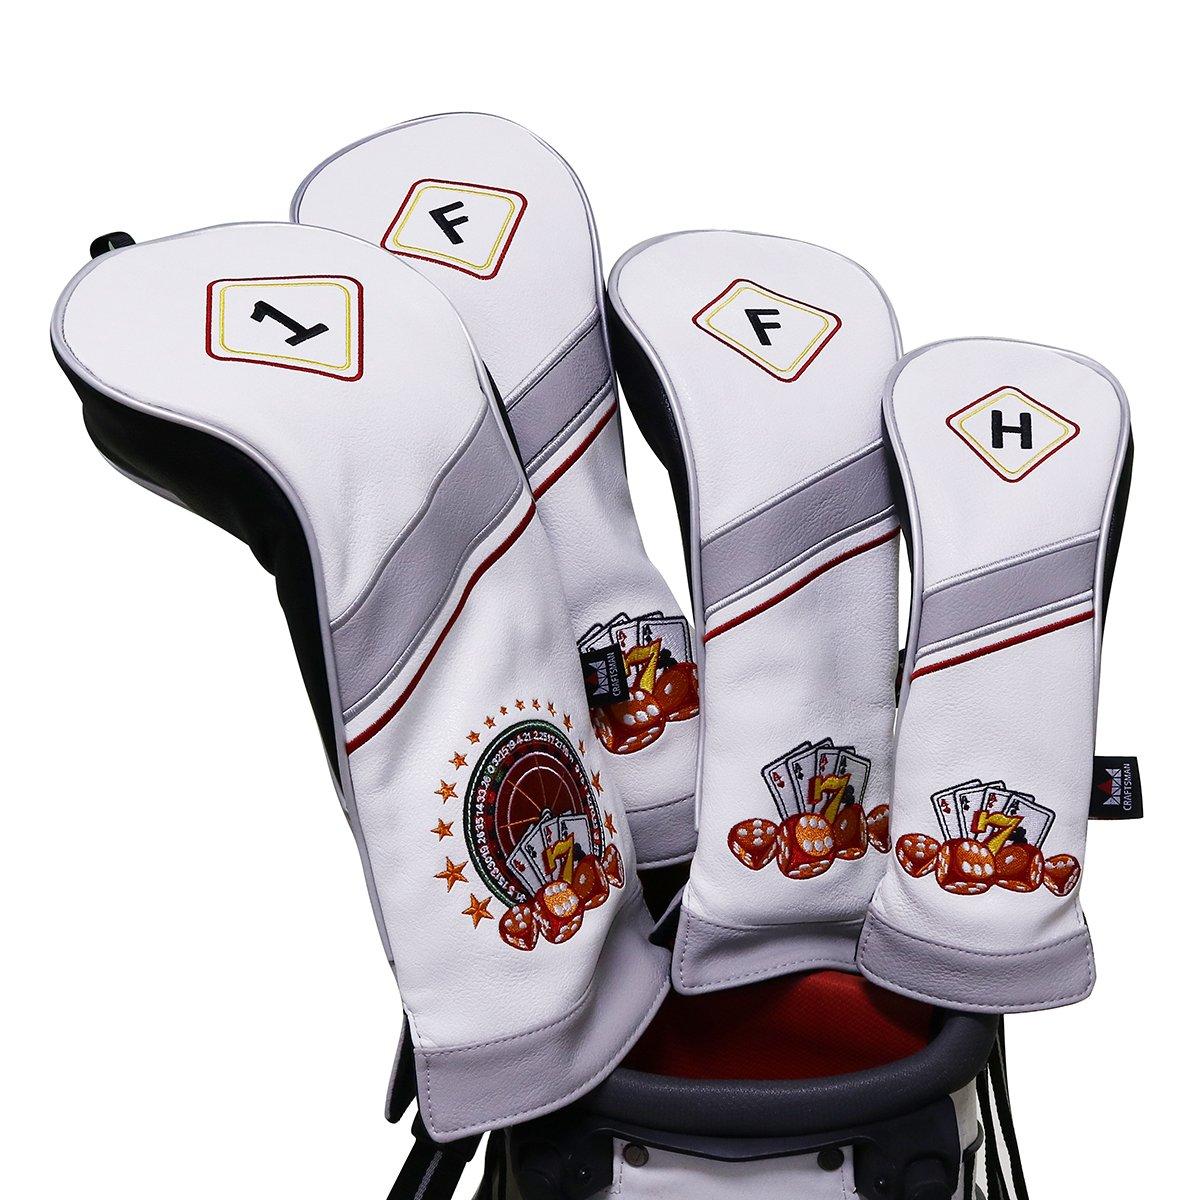 Craftsman Golf 4pcs / Set # 1 # 3 # 5 H耐久性PUレザーヴィンテージ460 ccドライバーFairway WoodsハイブリッドHeadcovers Set for Taylormade、Callaway、Titleist、Ping B077V8HP97 Roulette